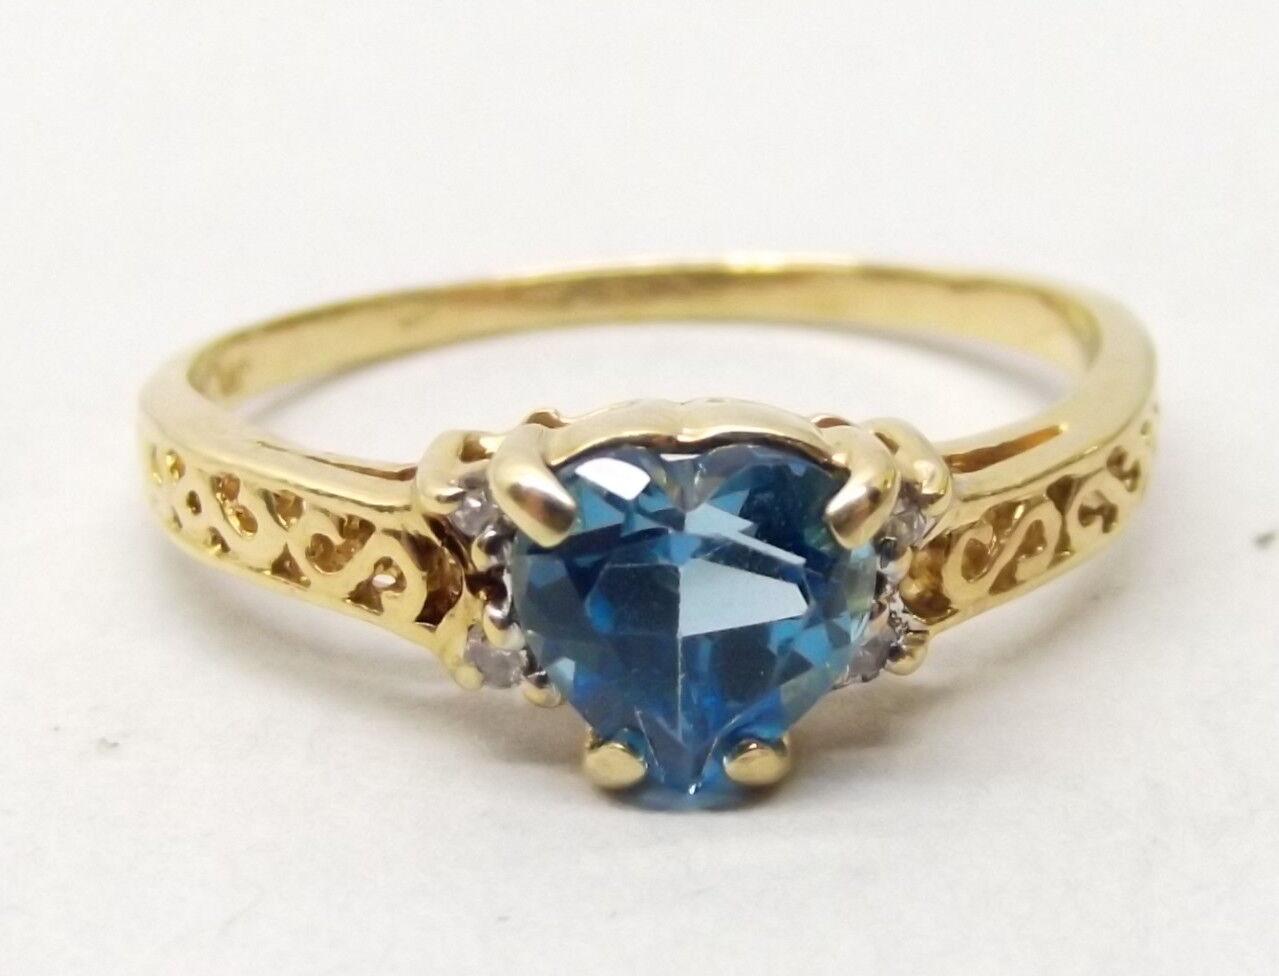 Vtg 14K gold blueeee Topaz Heart Cut Ring Sz 7 Diamond Accent Stone Ornate Scroll